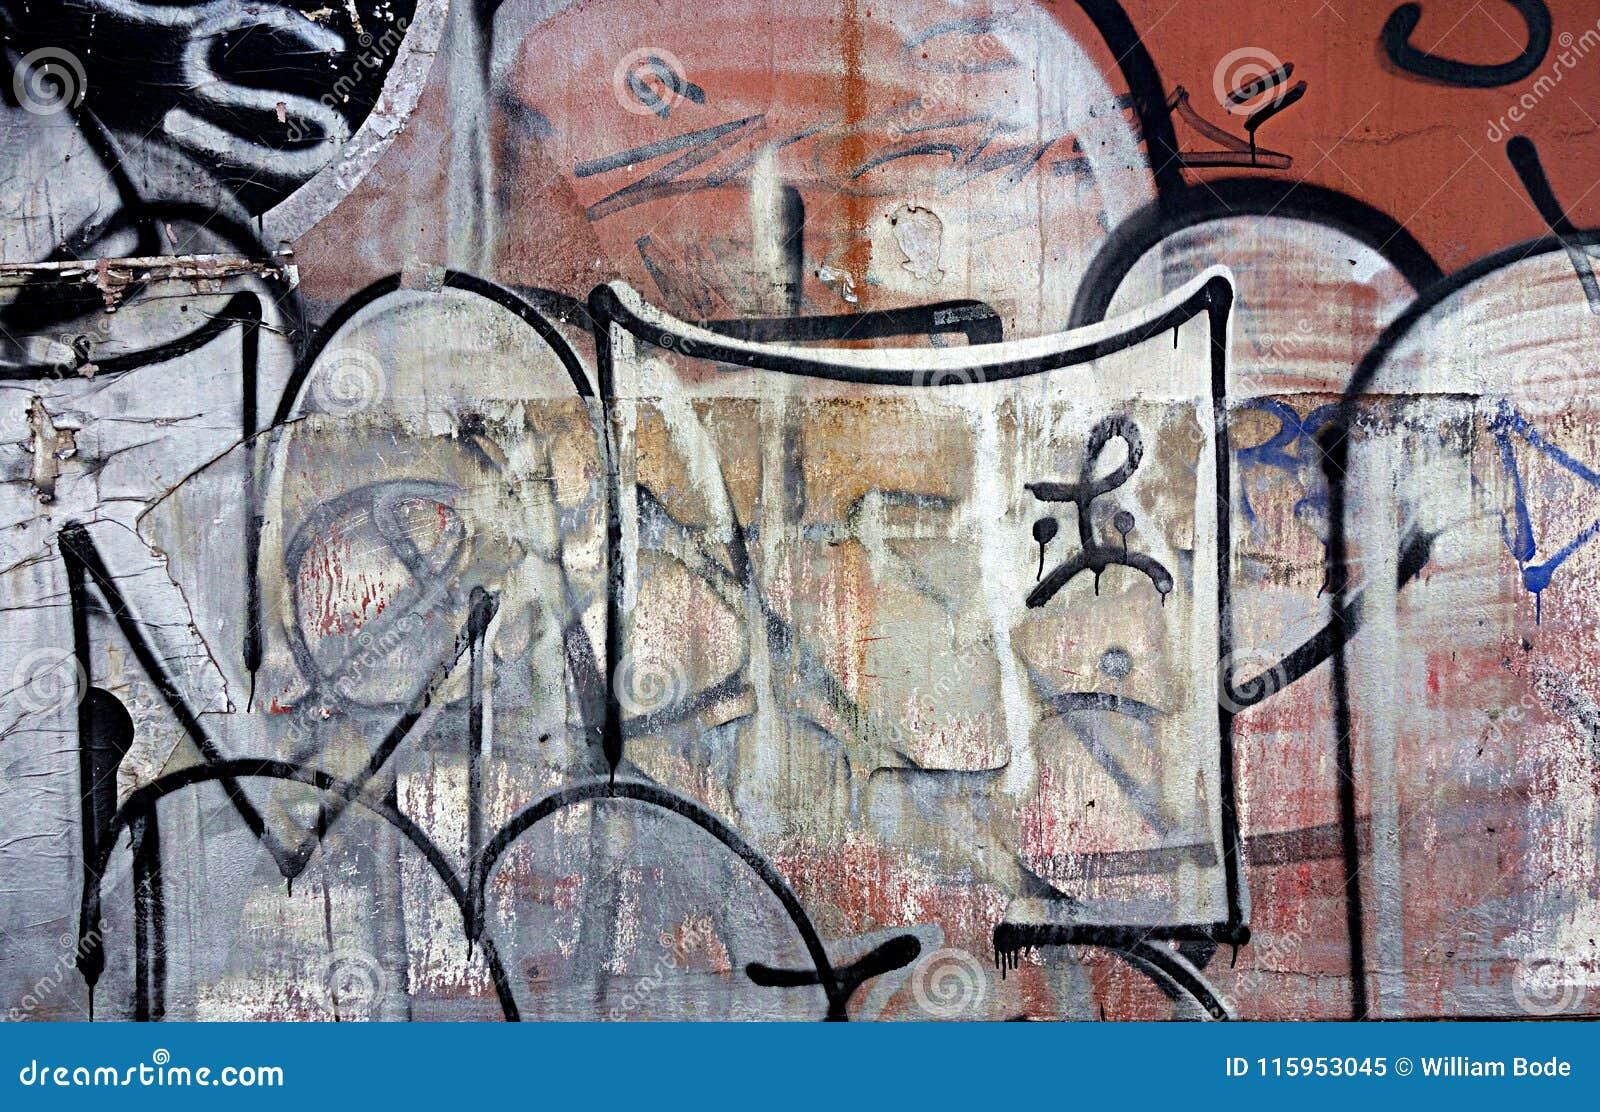 Multiple Layers Of Illegal Graffiti